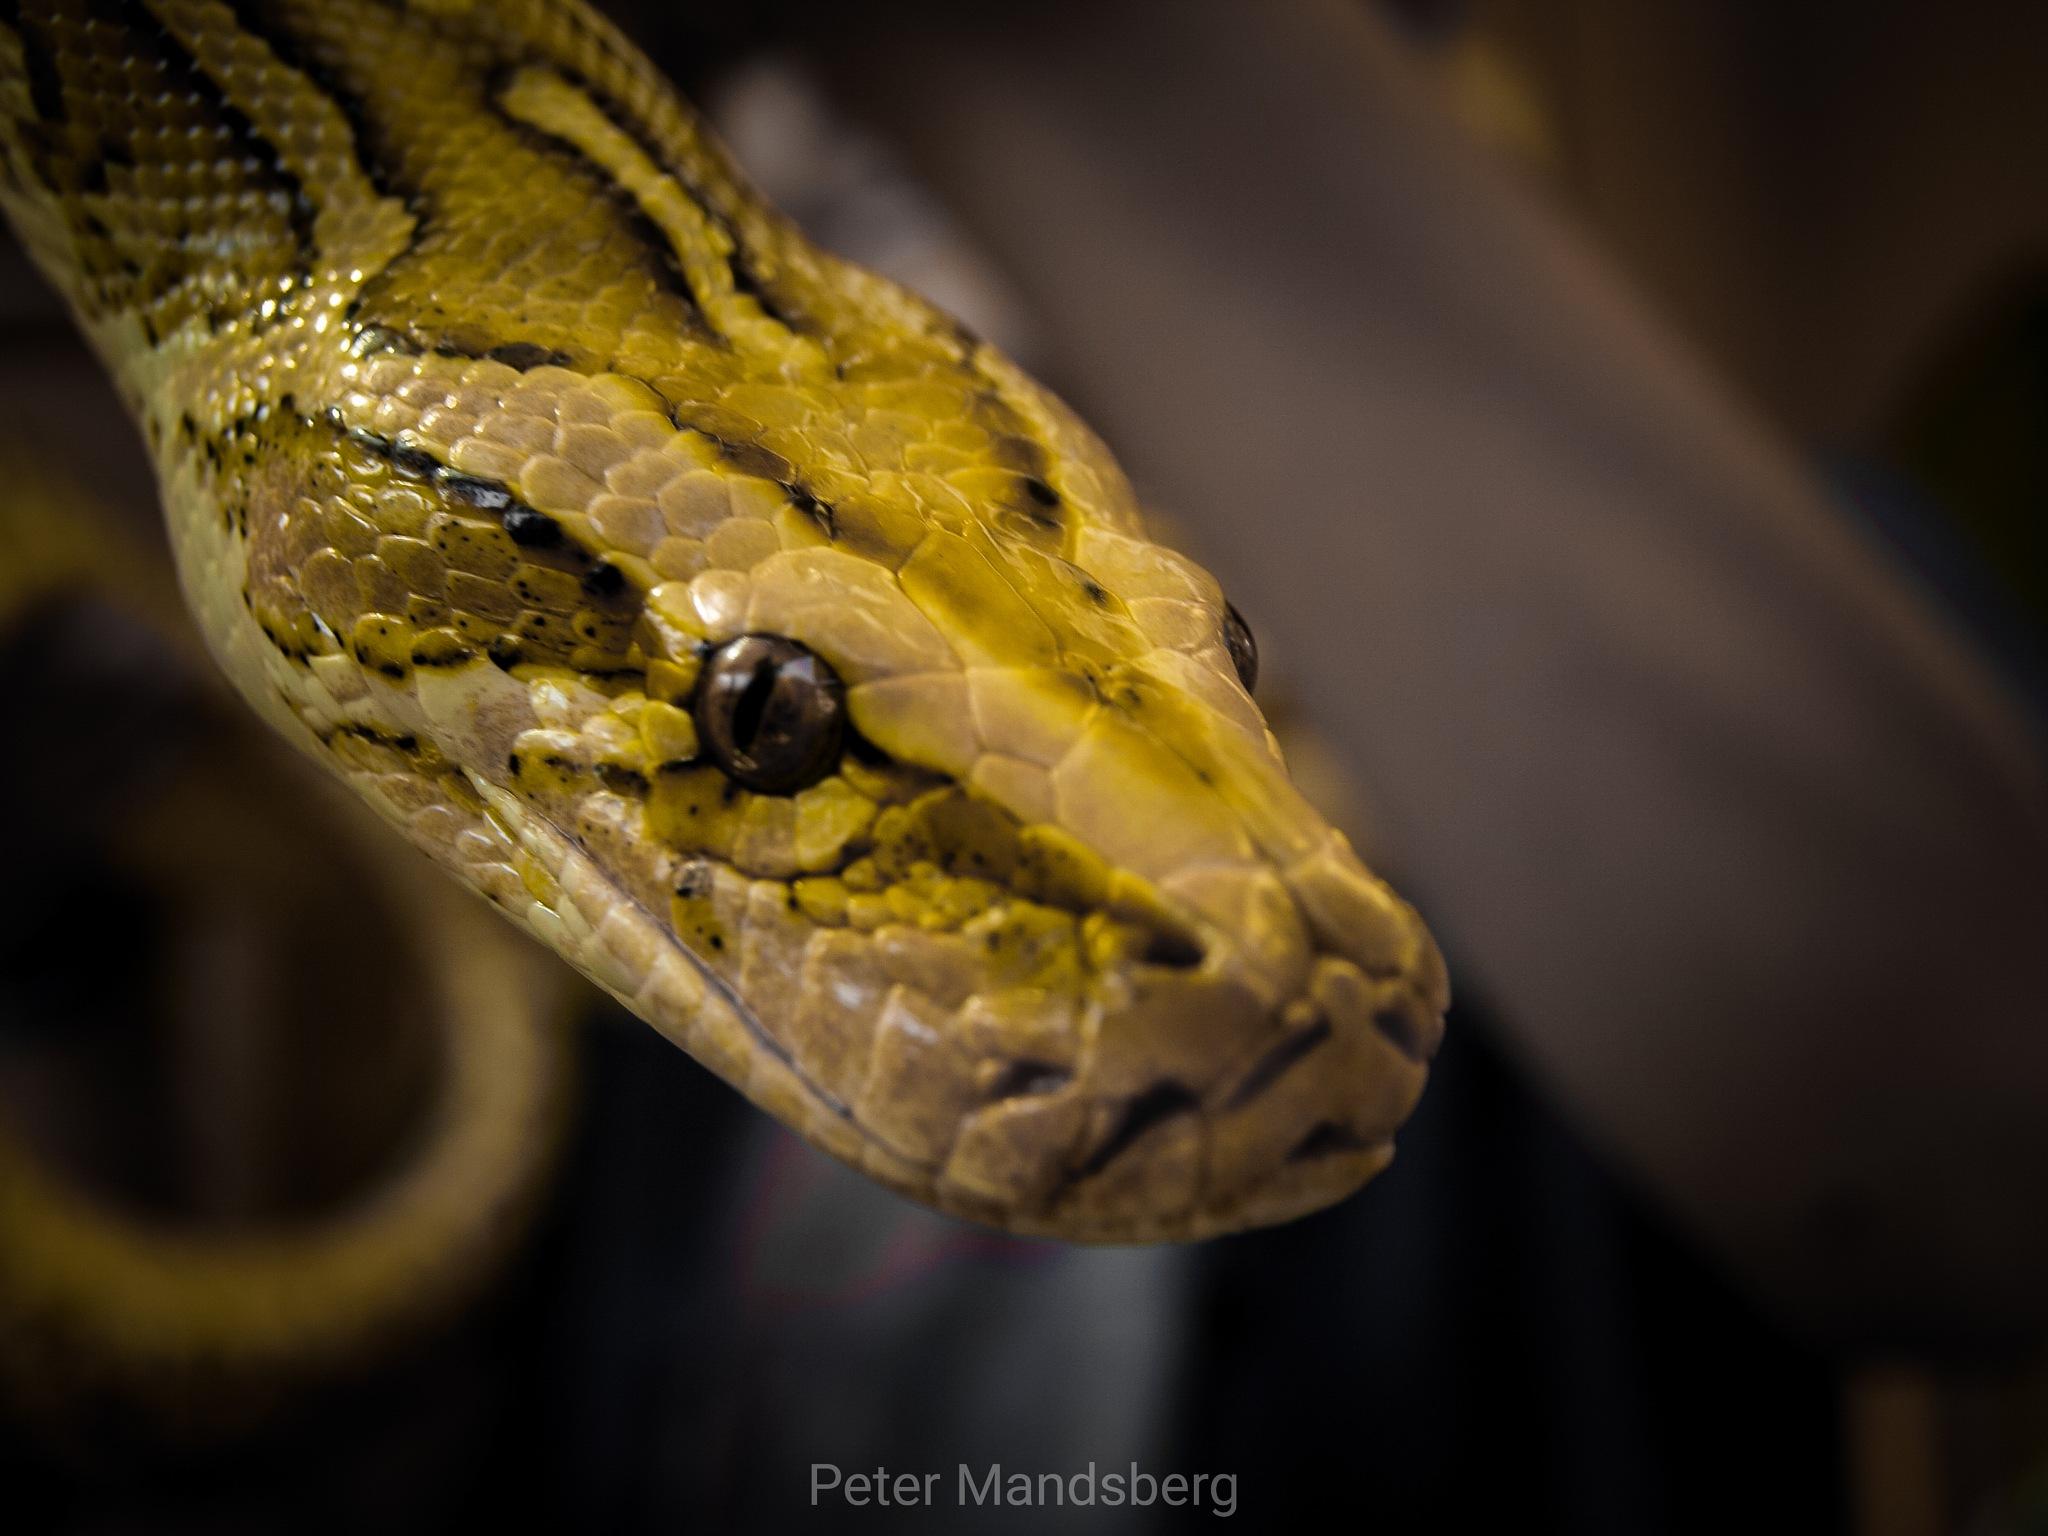 Snake by Peter Mandsberg